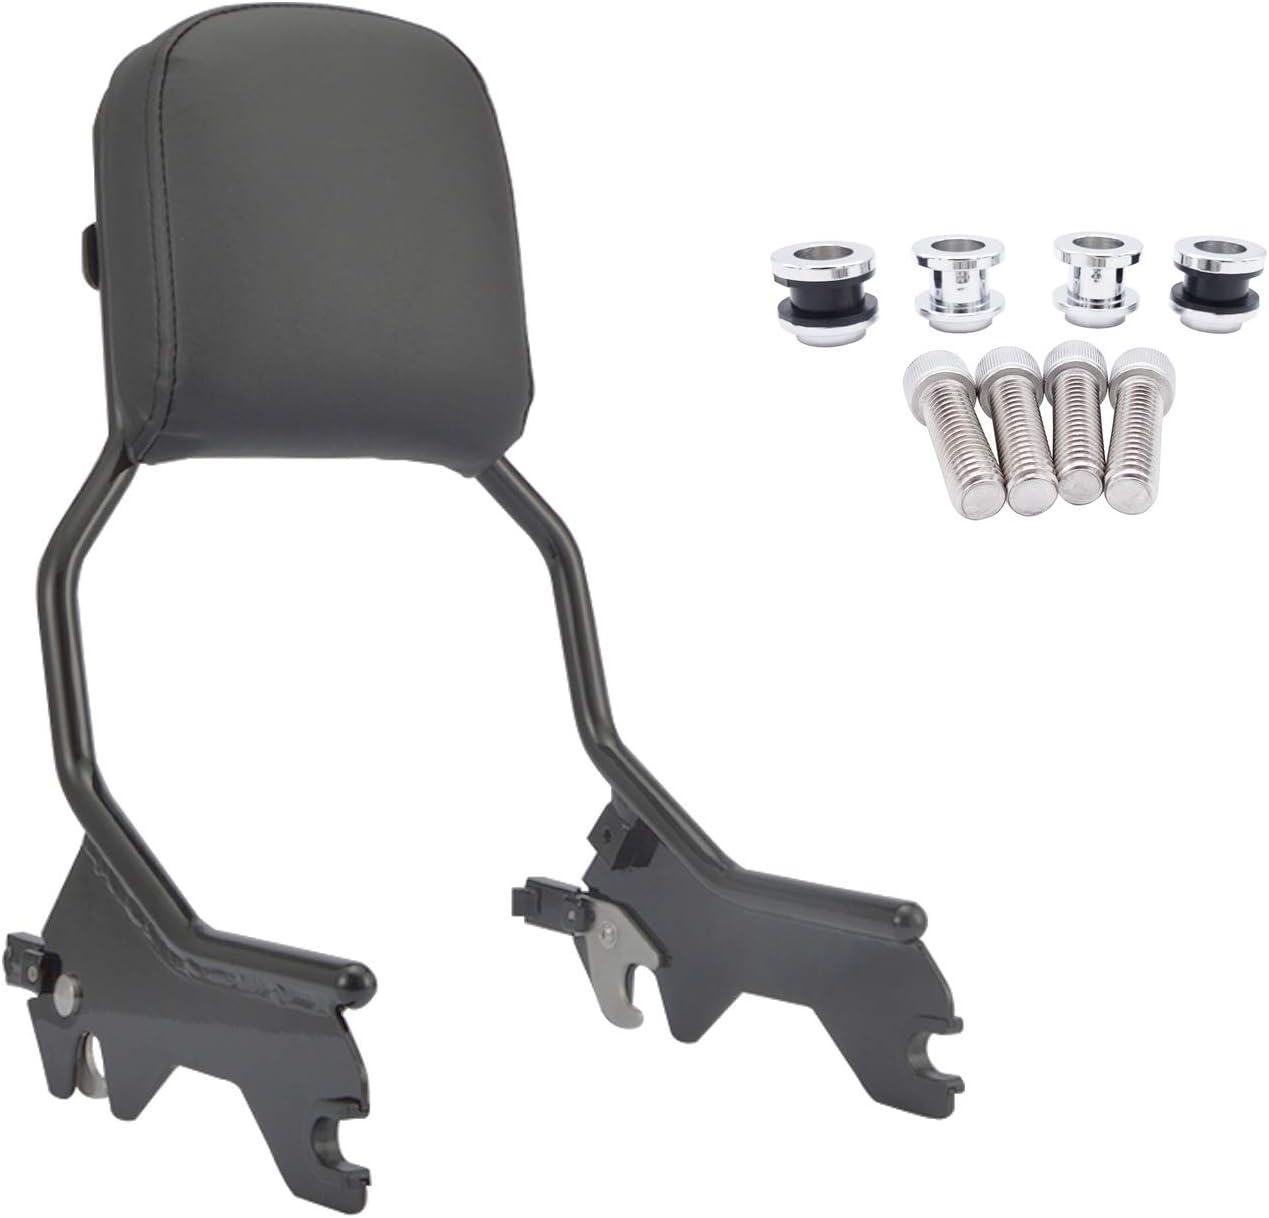 HTTMT Holdfast Sissy Bar Backrest Upright Standard Black Compatible With 2018-2020 Harley FLFB FLFBS FXBR FXBRS/ P//N: TGHD-SBB048